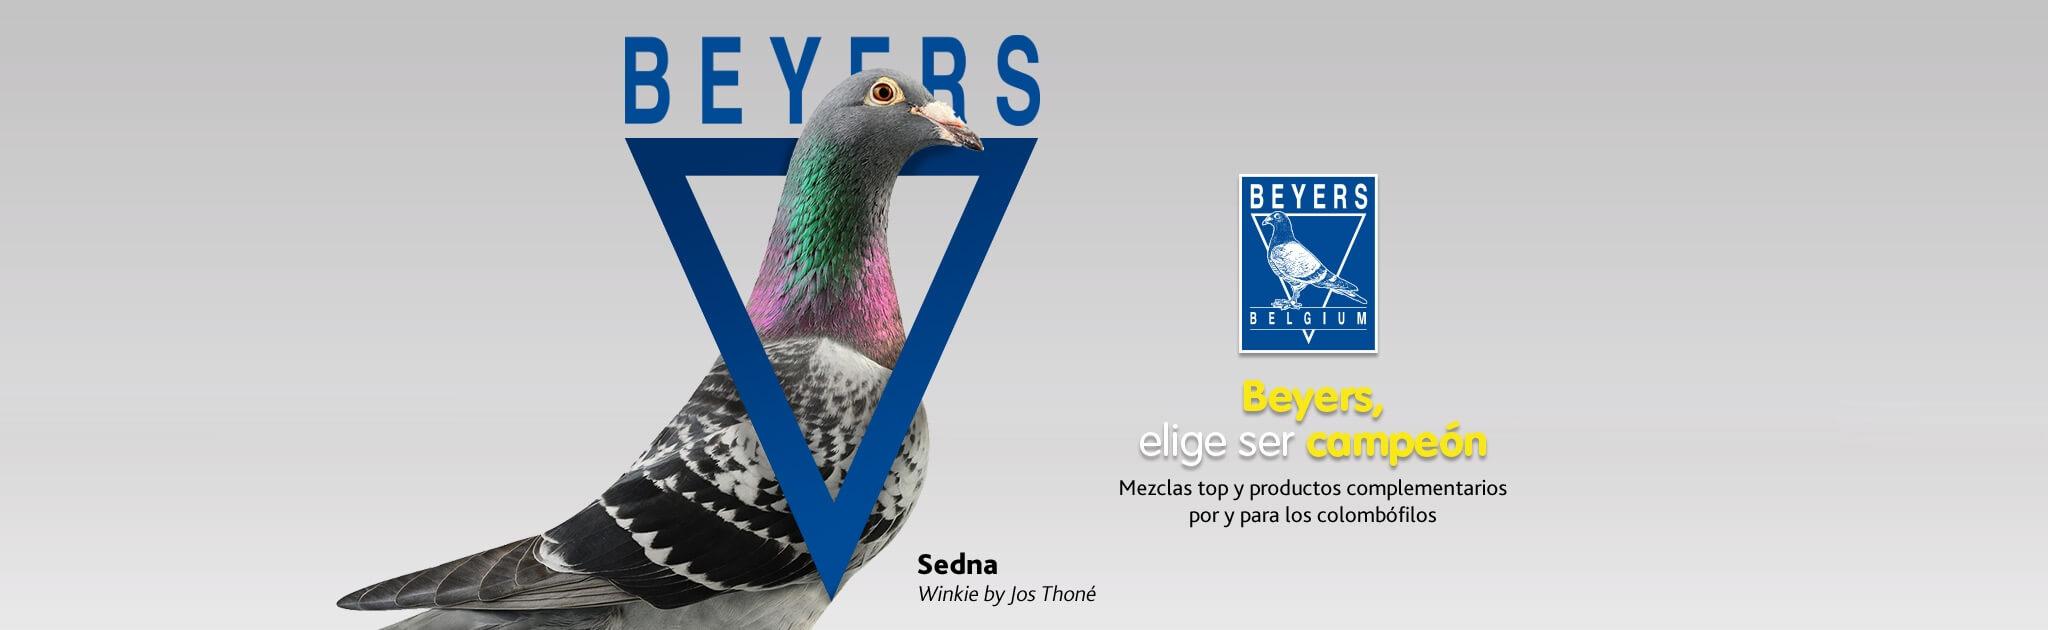 Beyers, elige al campeón